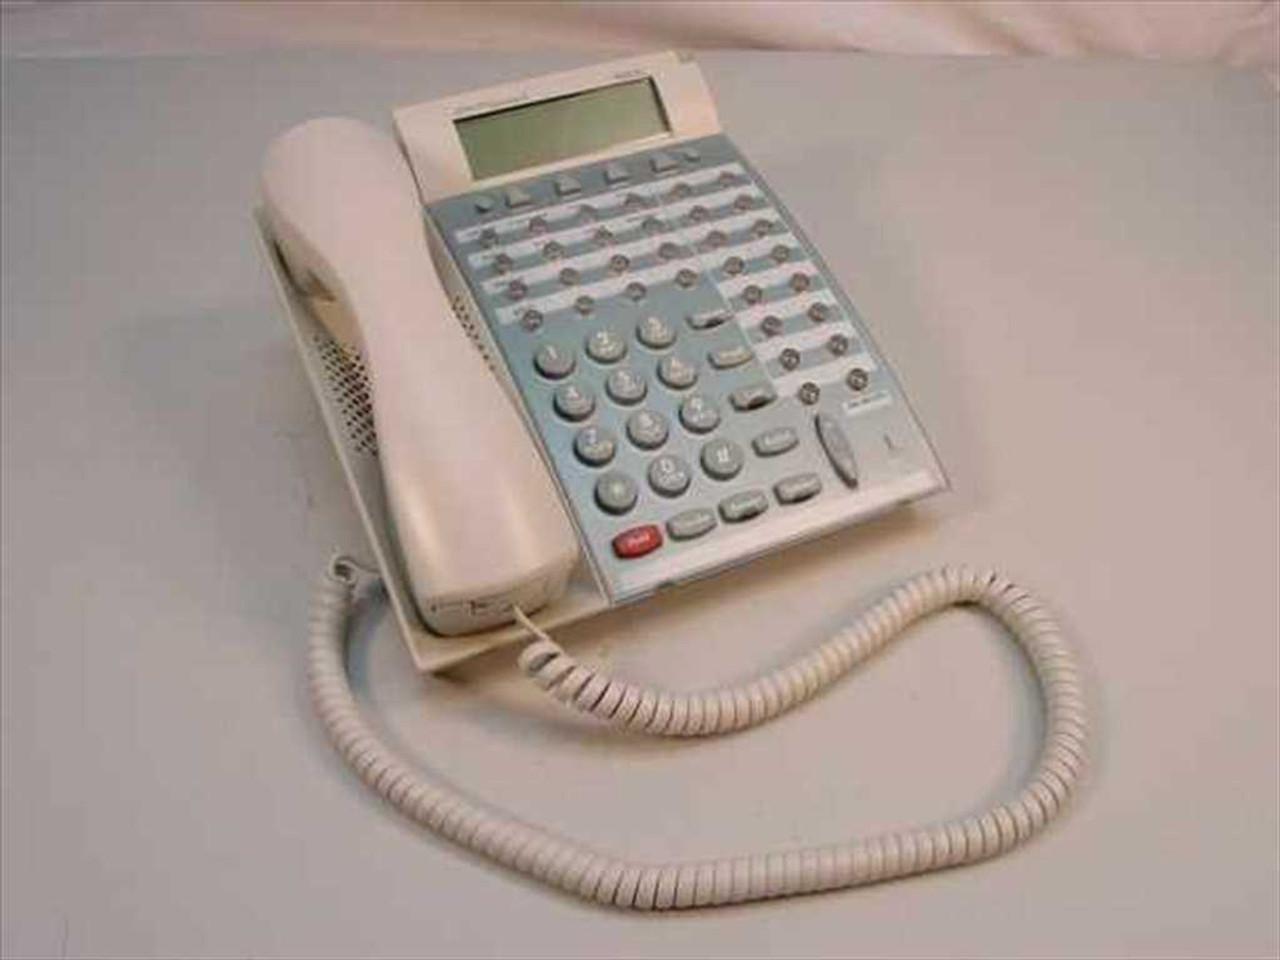 NEC Dterm Series E Telephones DTP-32D-1(WH) TEL NEAX ...